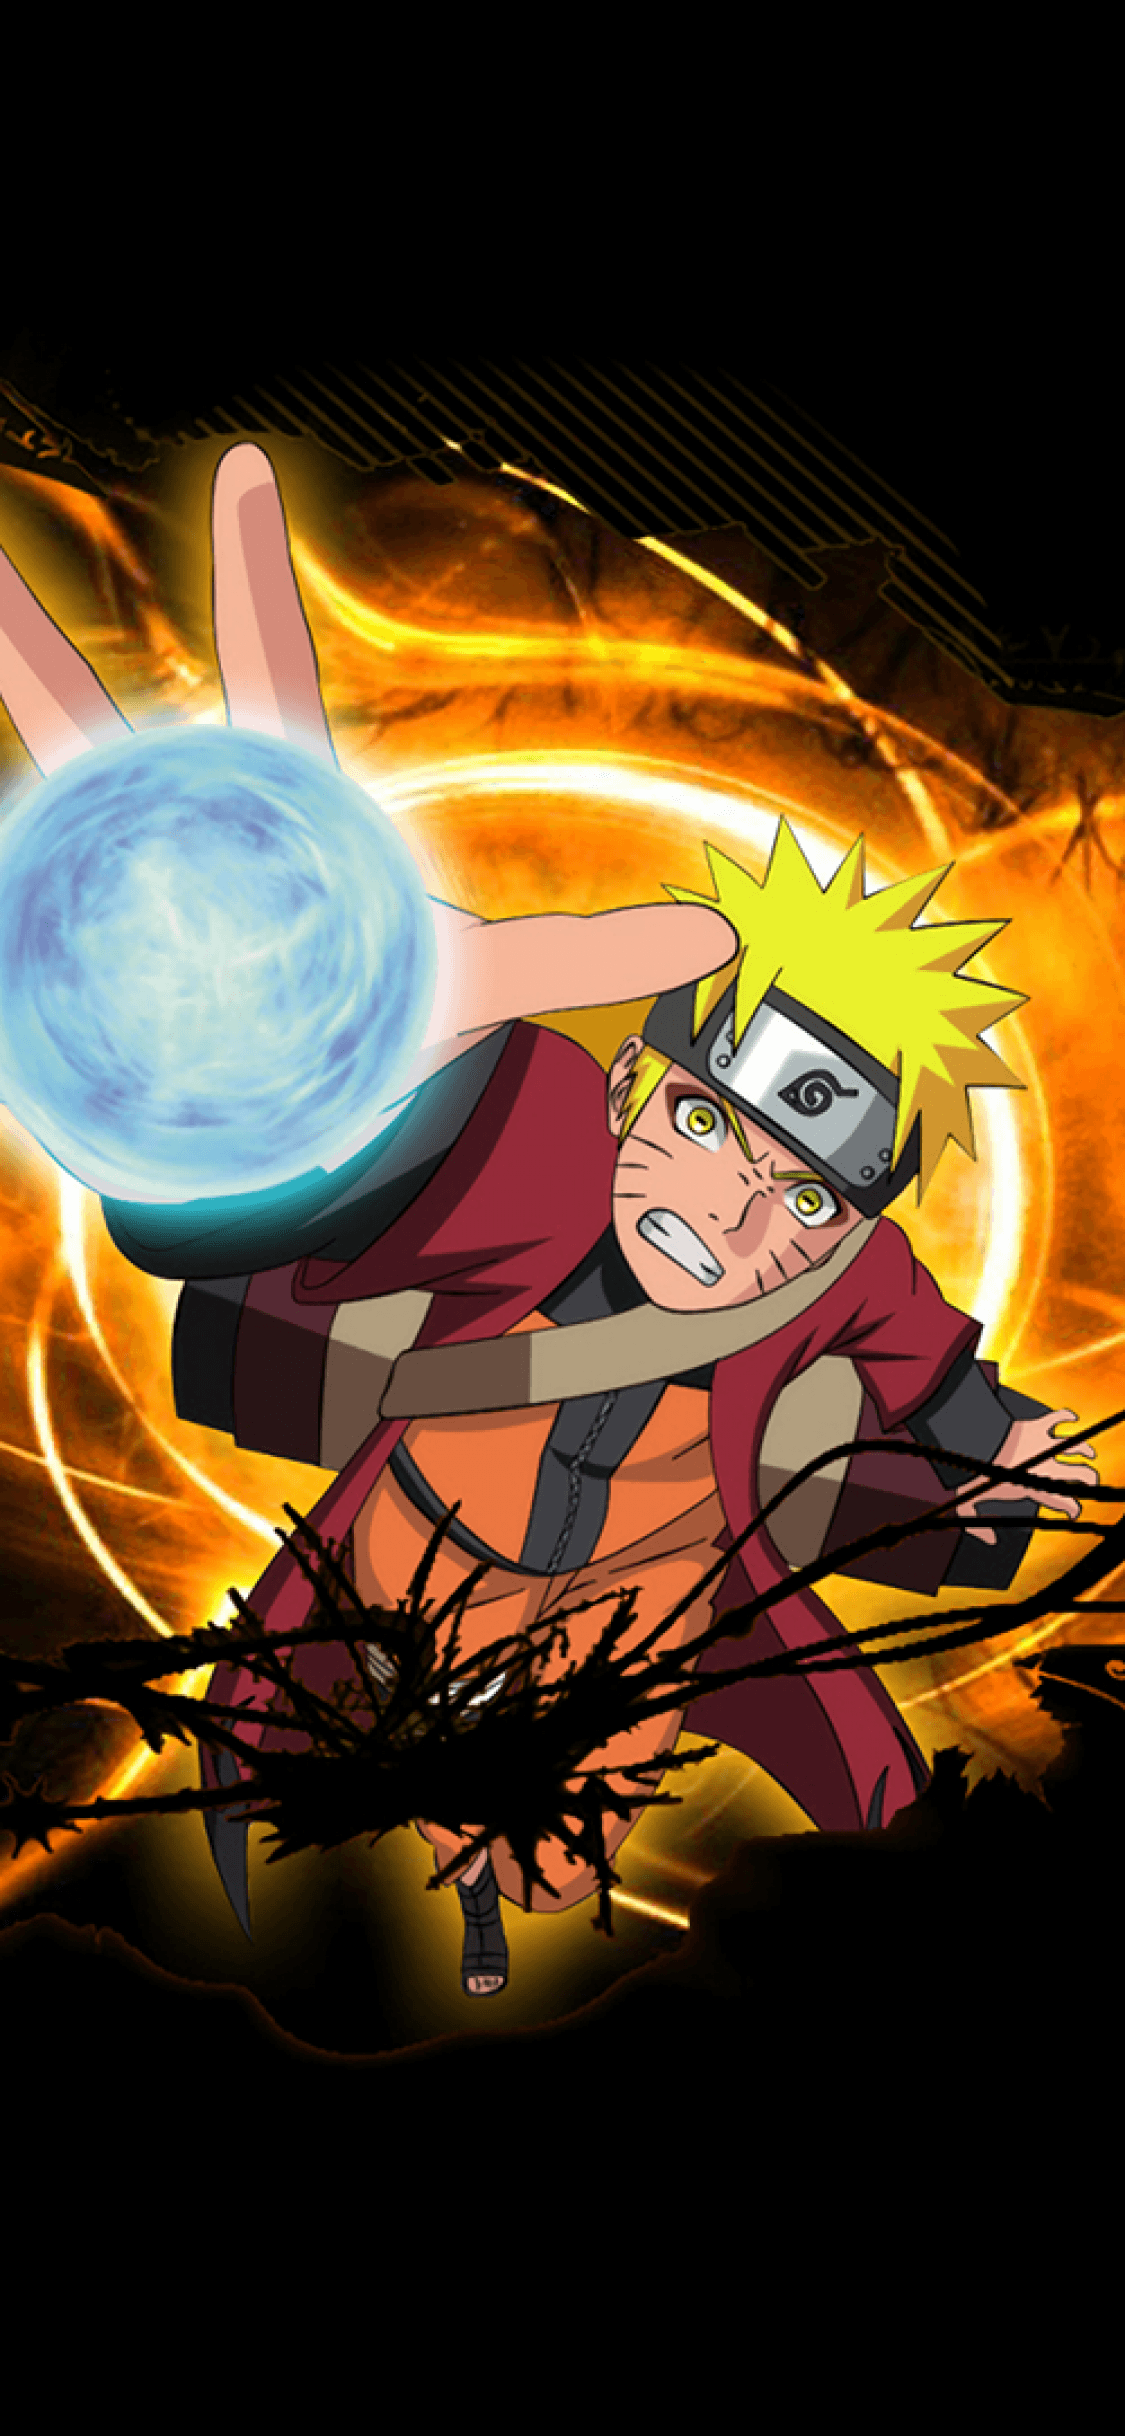 Naruto Anime Iphone X Wallpaper Andriblog001 In 2020 Hd Anime Wallpapers Anime Backgrounds Wallpapers Naruto Wallpaper Iphone